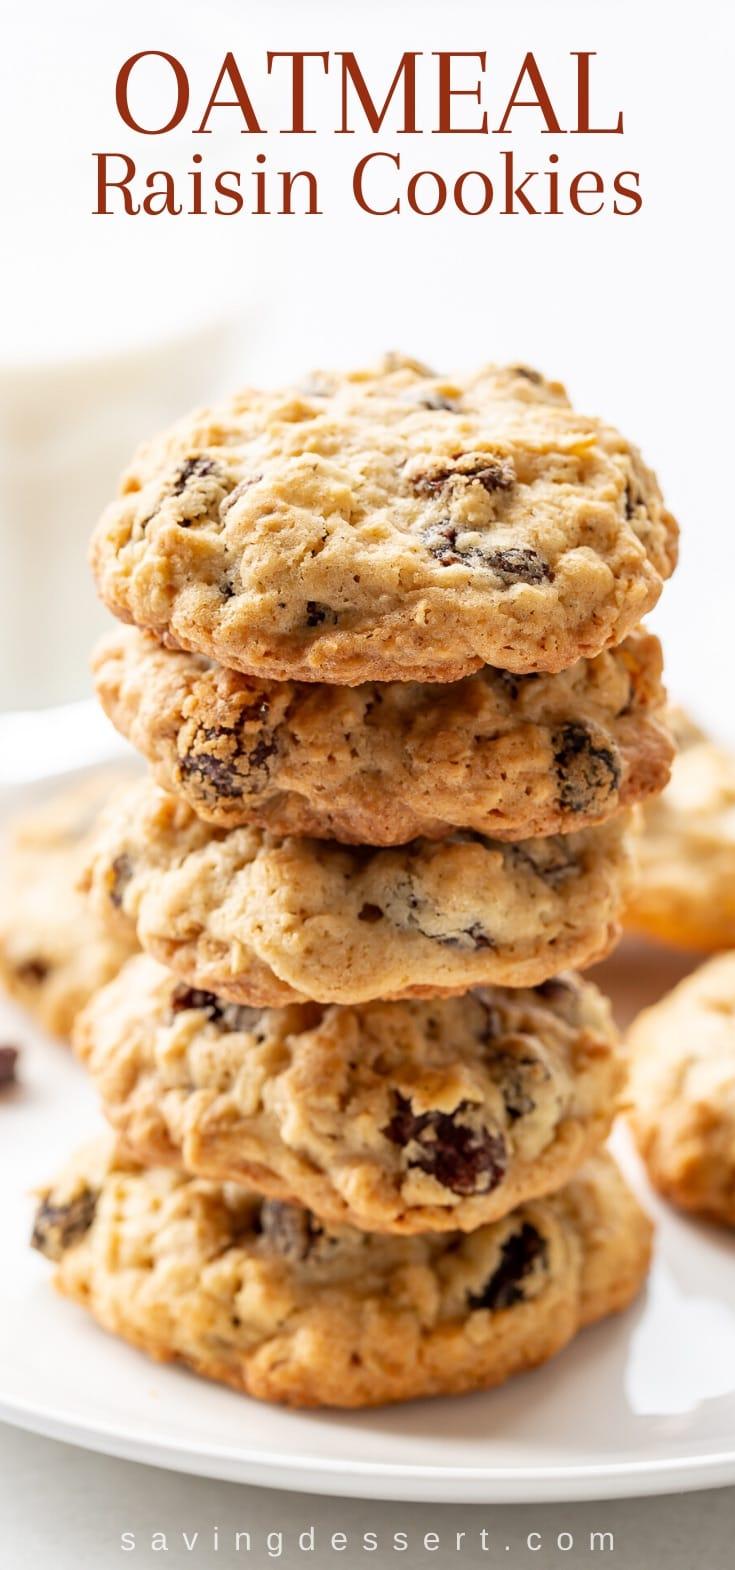 A closeup of a plate of oatmeal raisin cookies